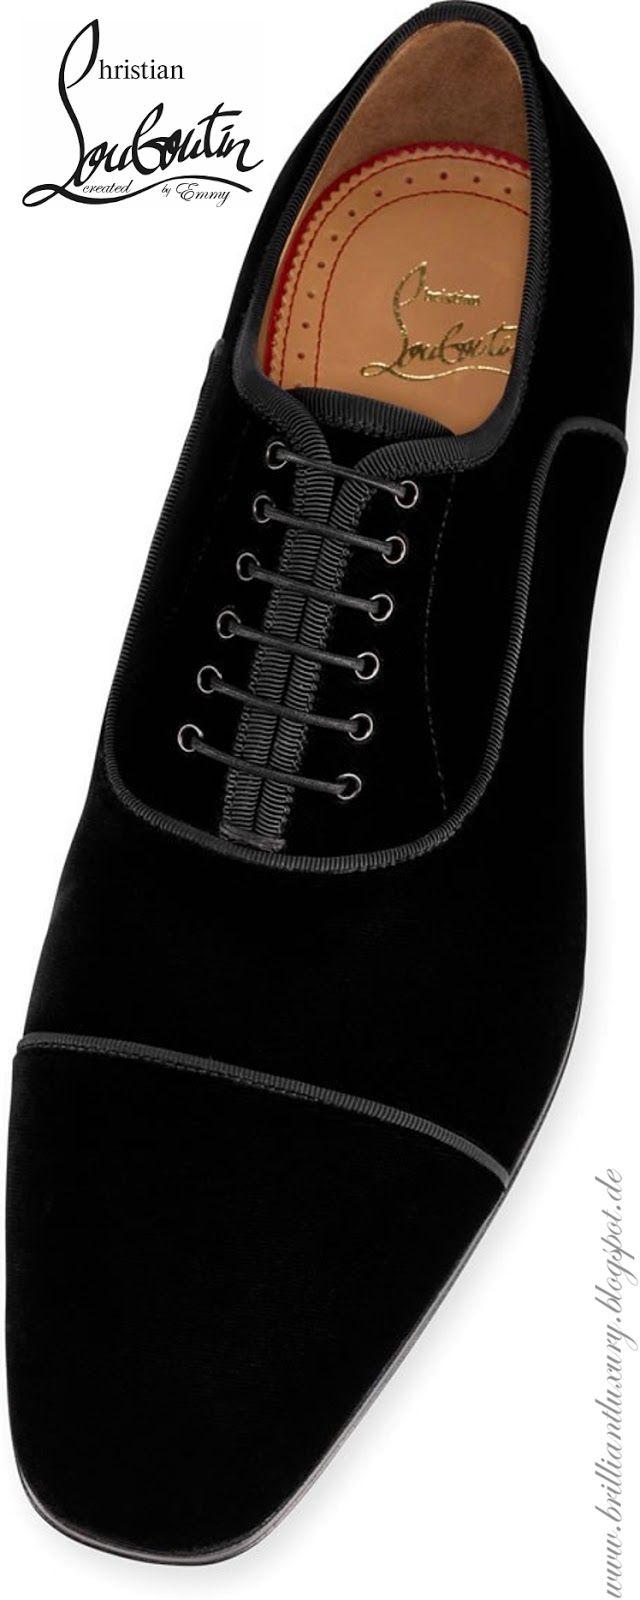 Brilliant Luxury ♦ Christian Louboutin Greggo Orlato Flat